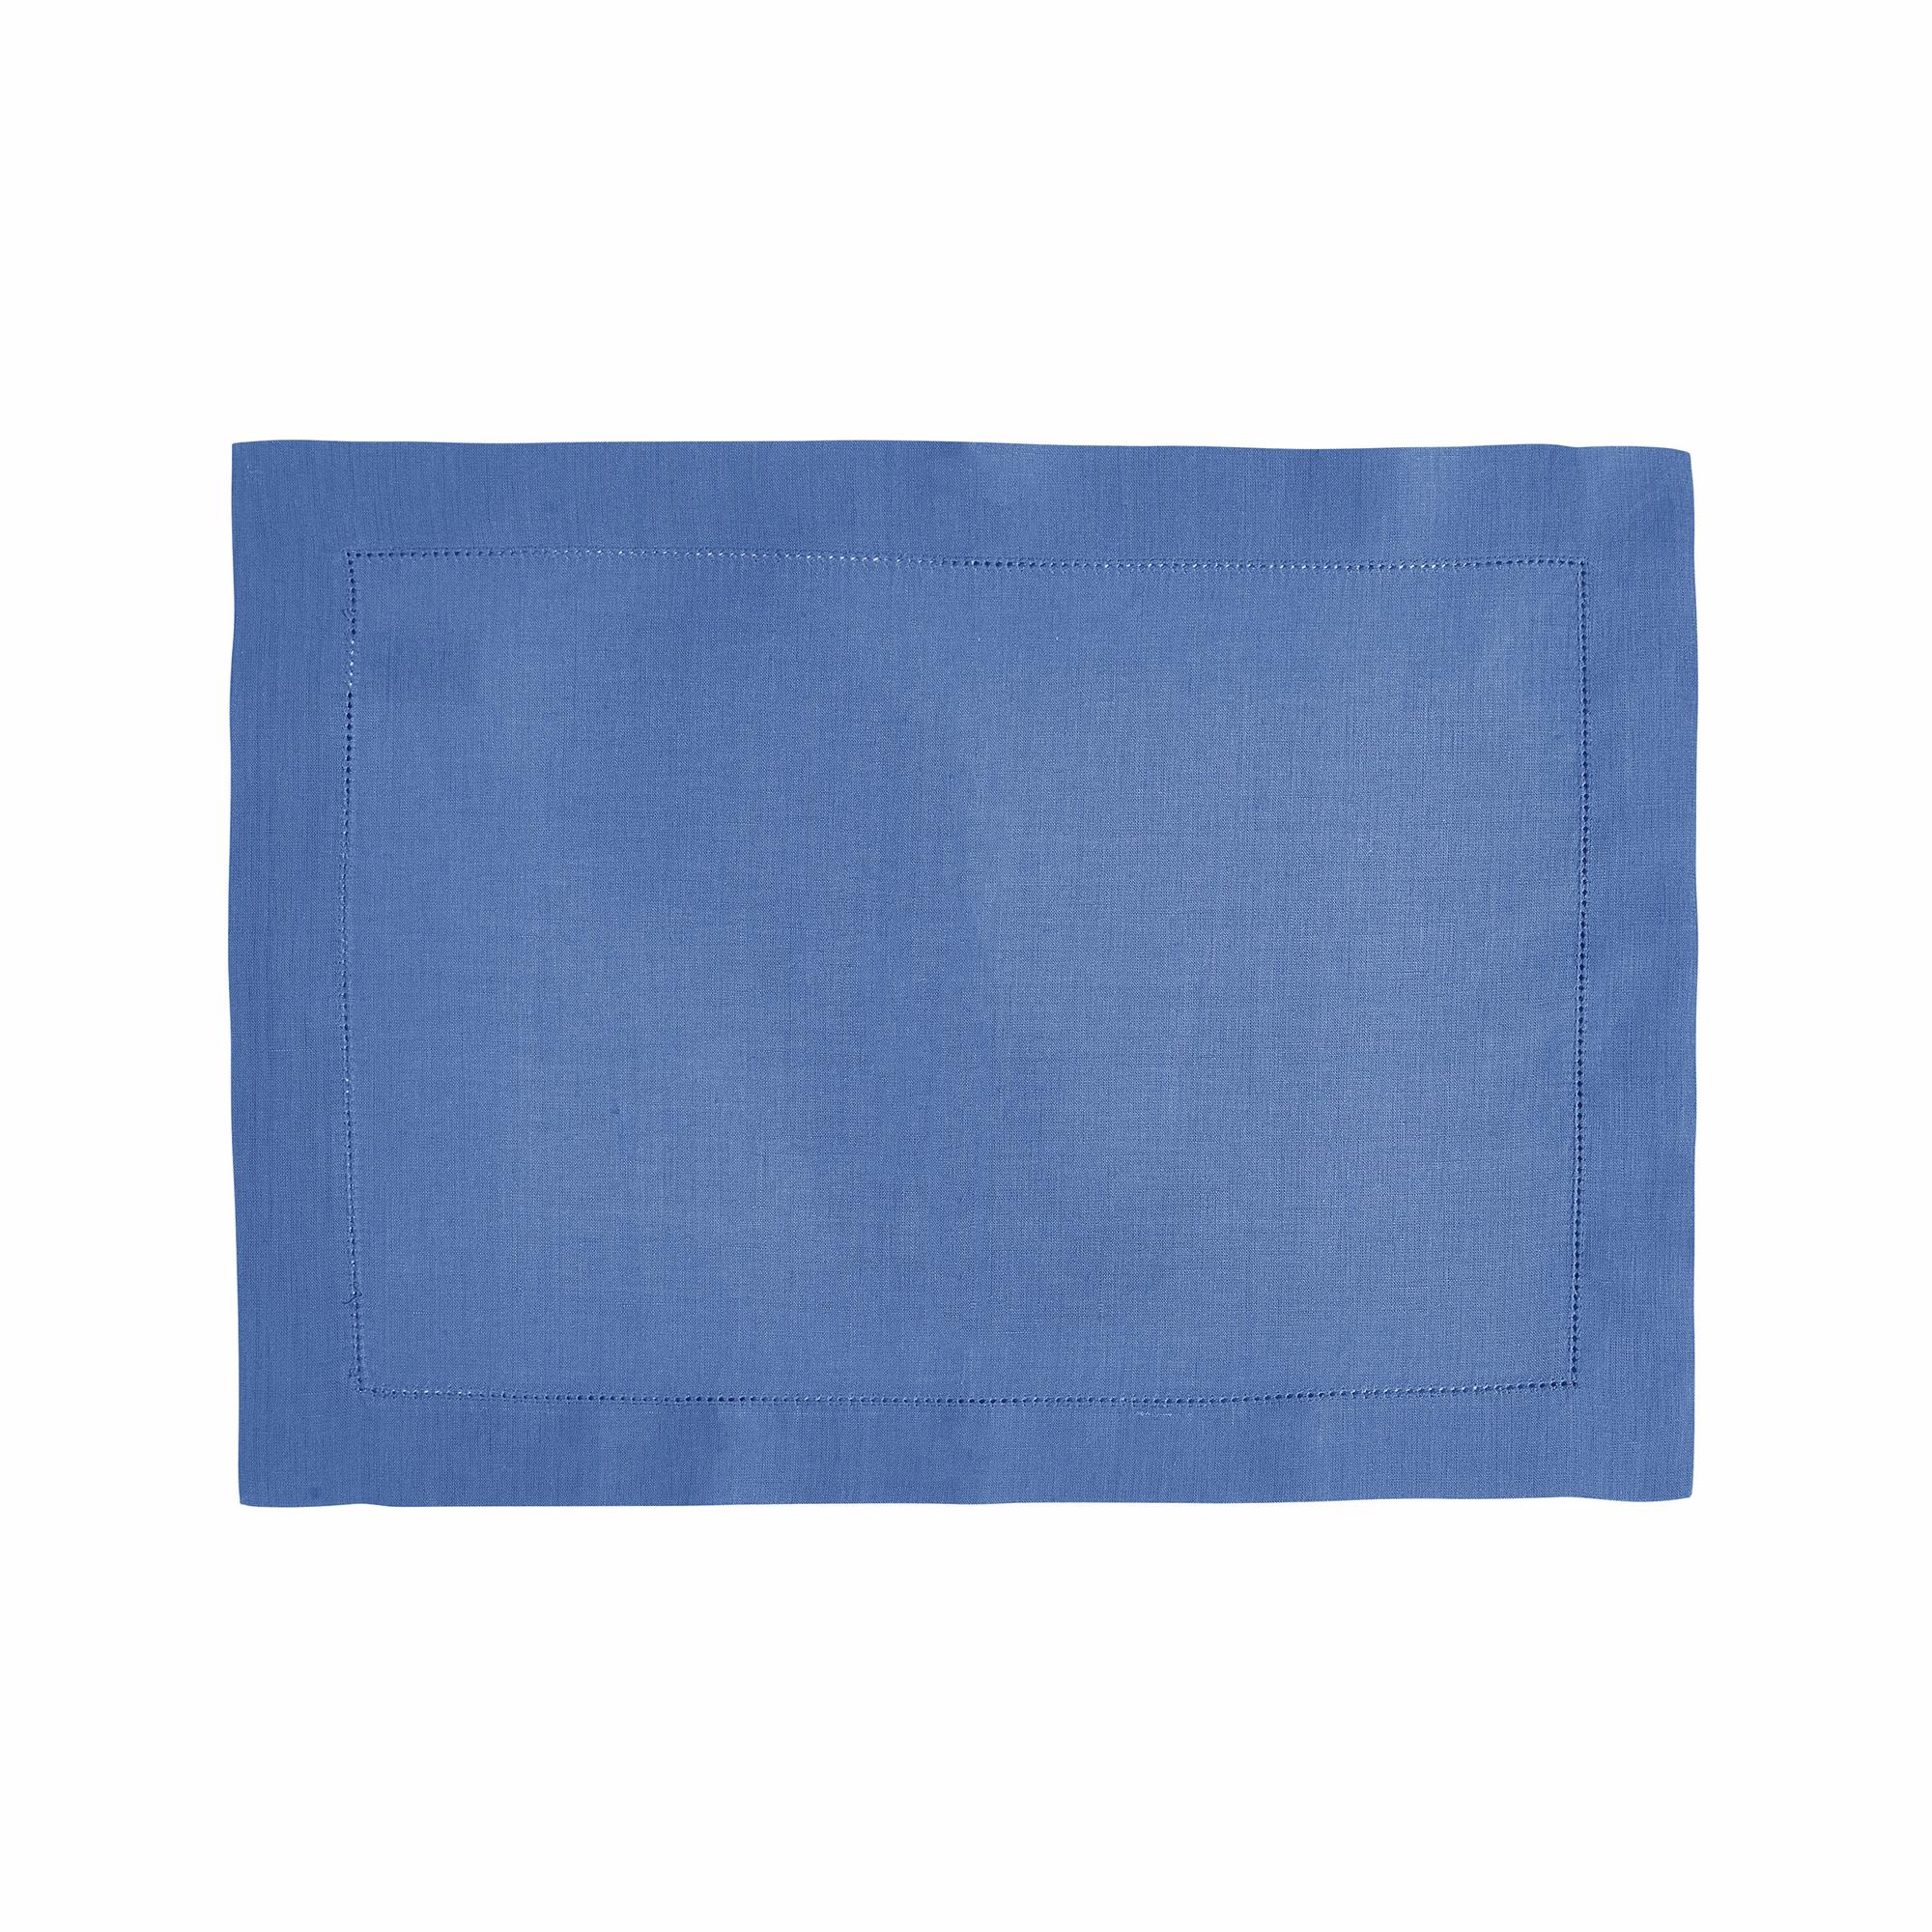 Set de table en lin bleu 37x50